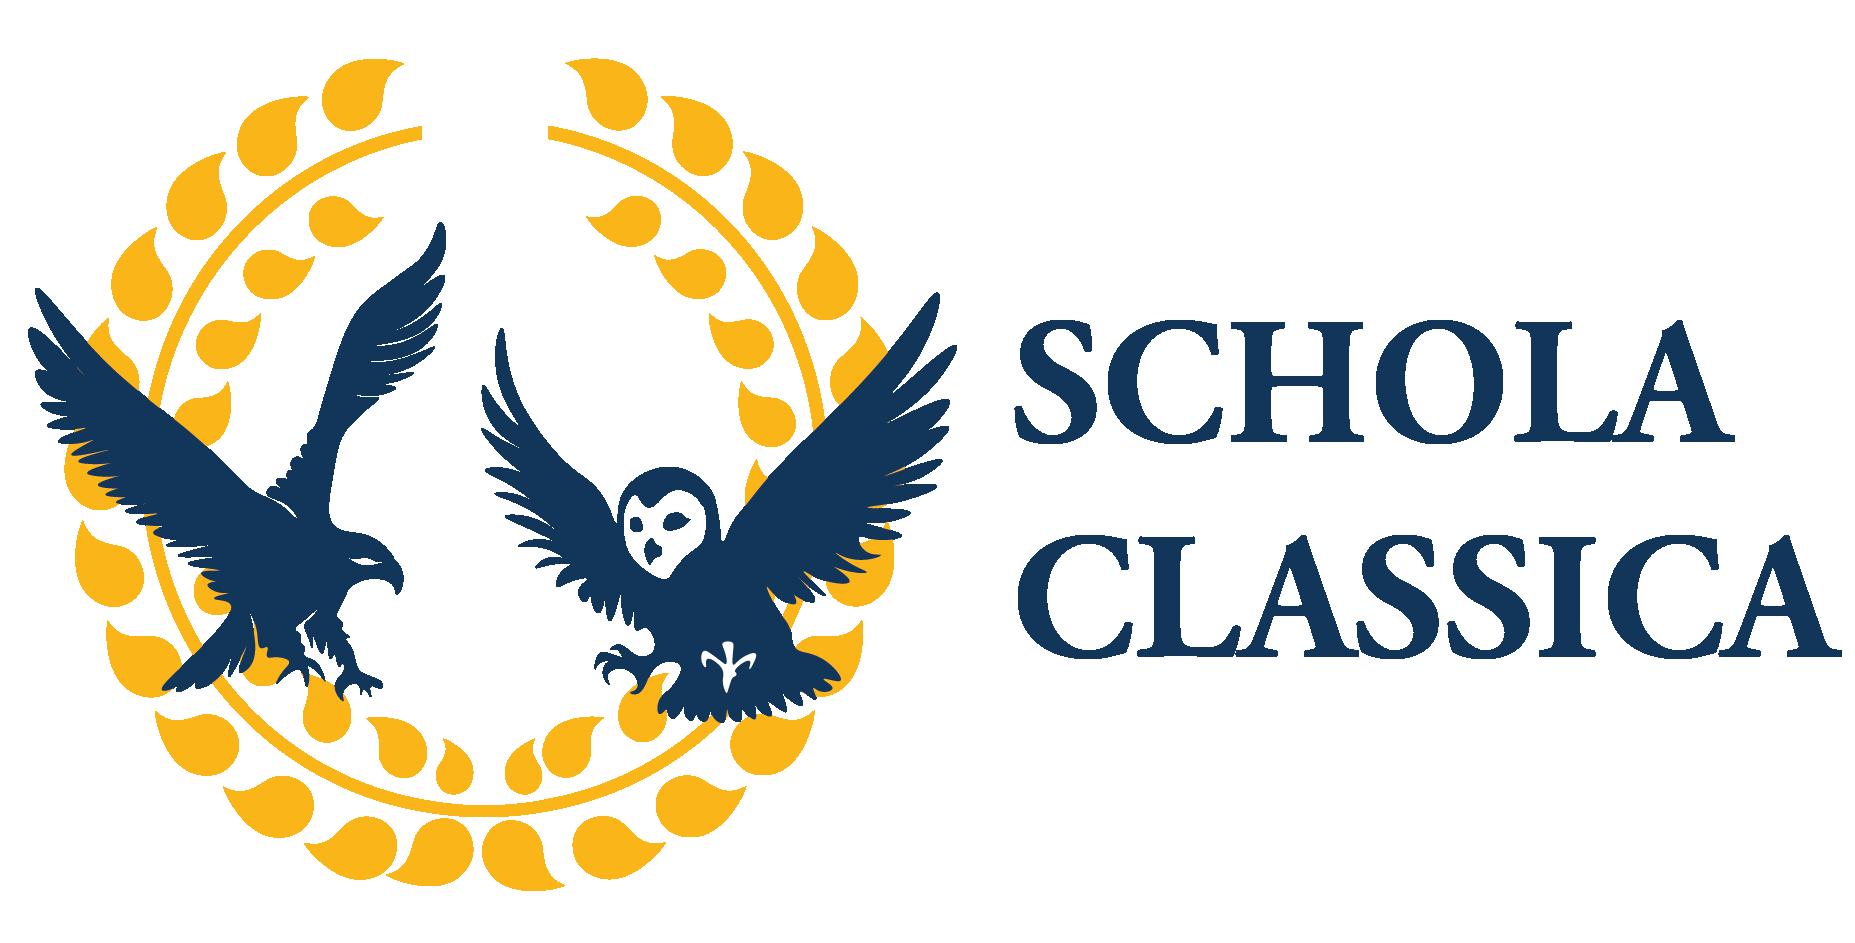 Schola Classica